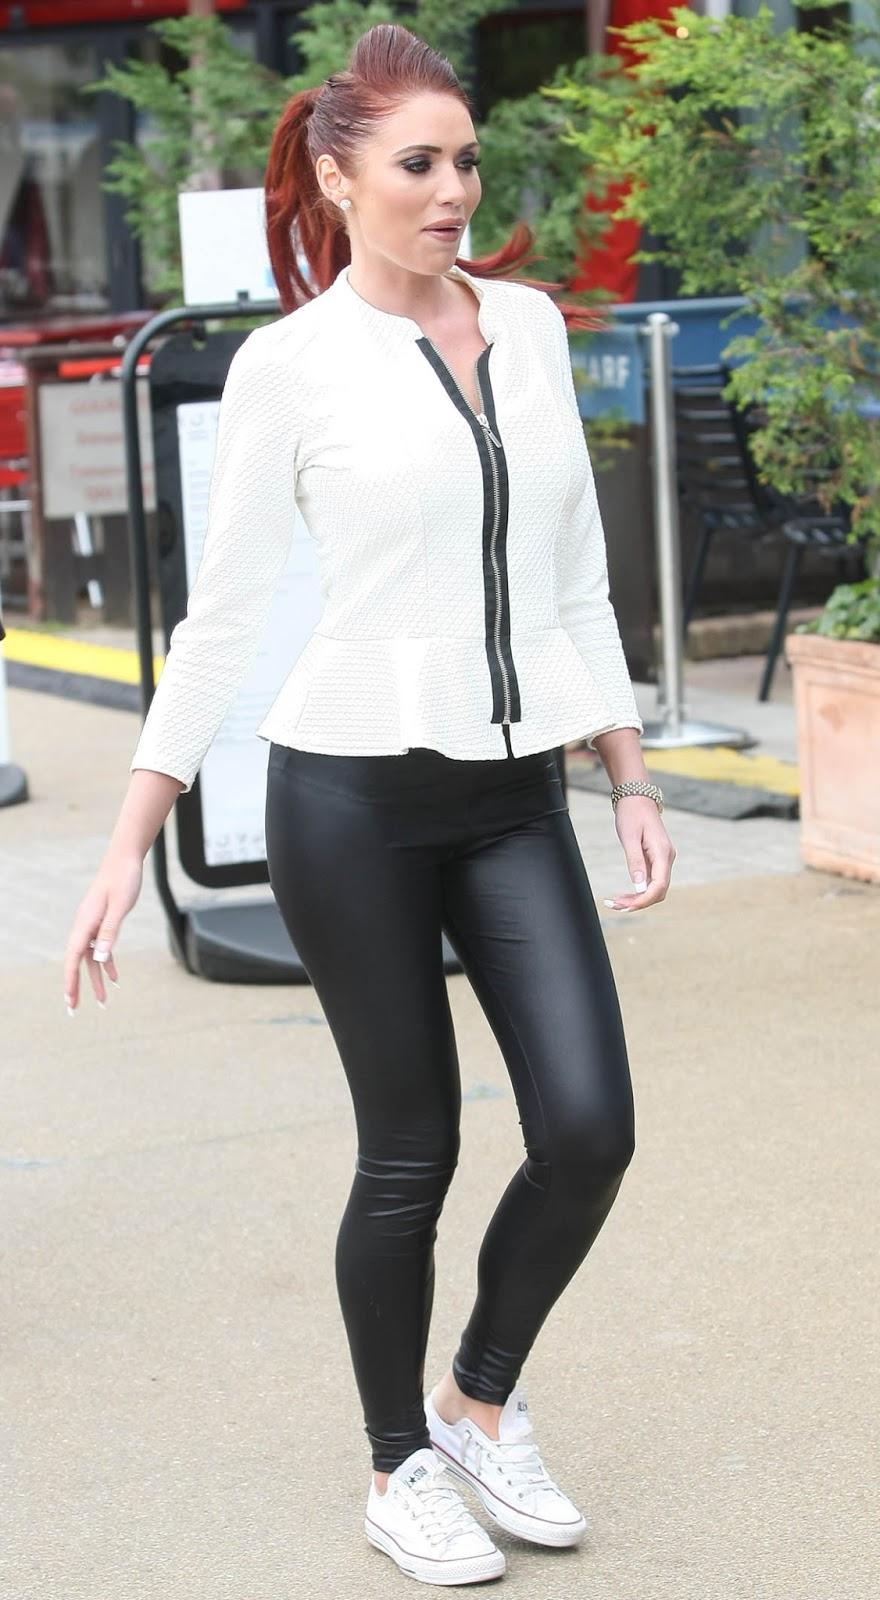 Jennifer Lopez Booty in Leggings - Celebrity Photos